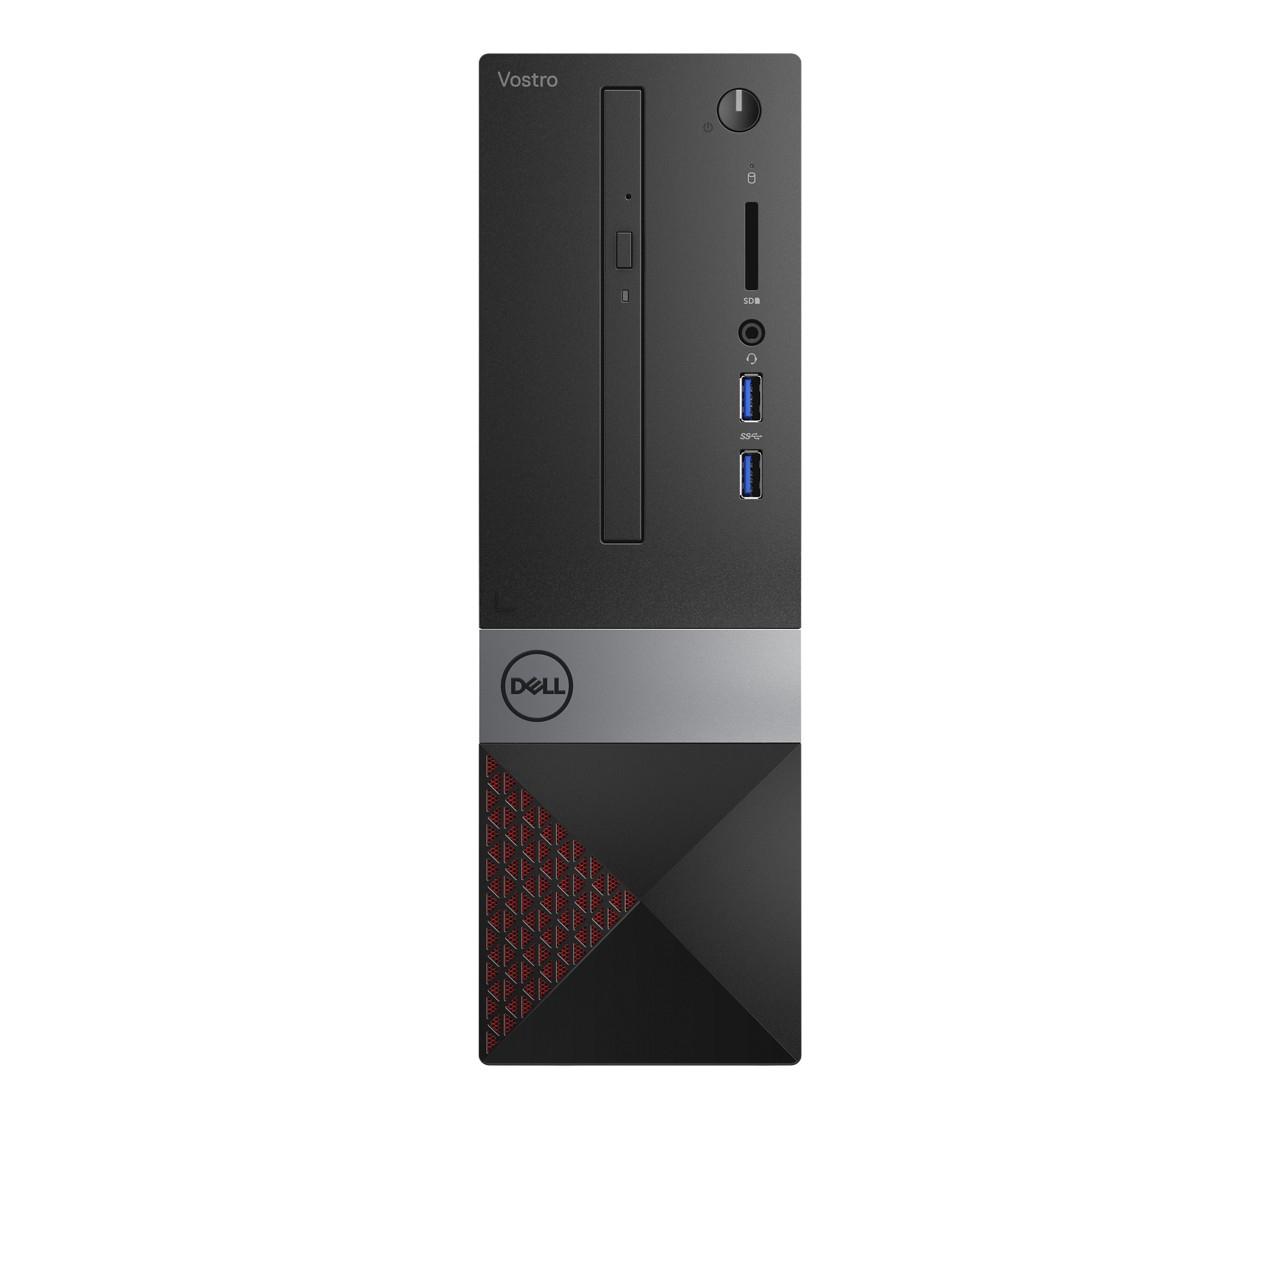 DELL Vostro 3470 8th gen Intel® Core™ i5 i5-8400 8 GB DDR4-SDRAM 256 GB SSD Black,Grey,Red SFF PC